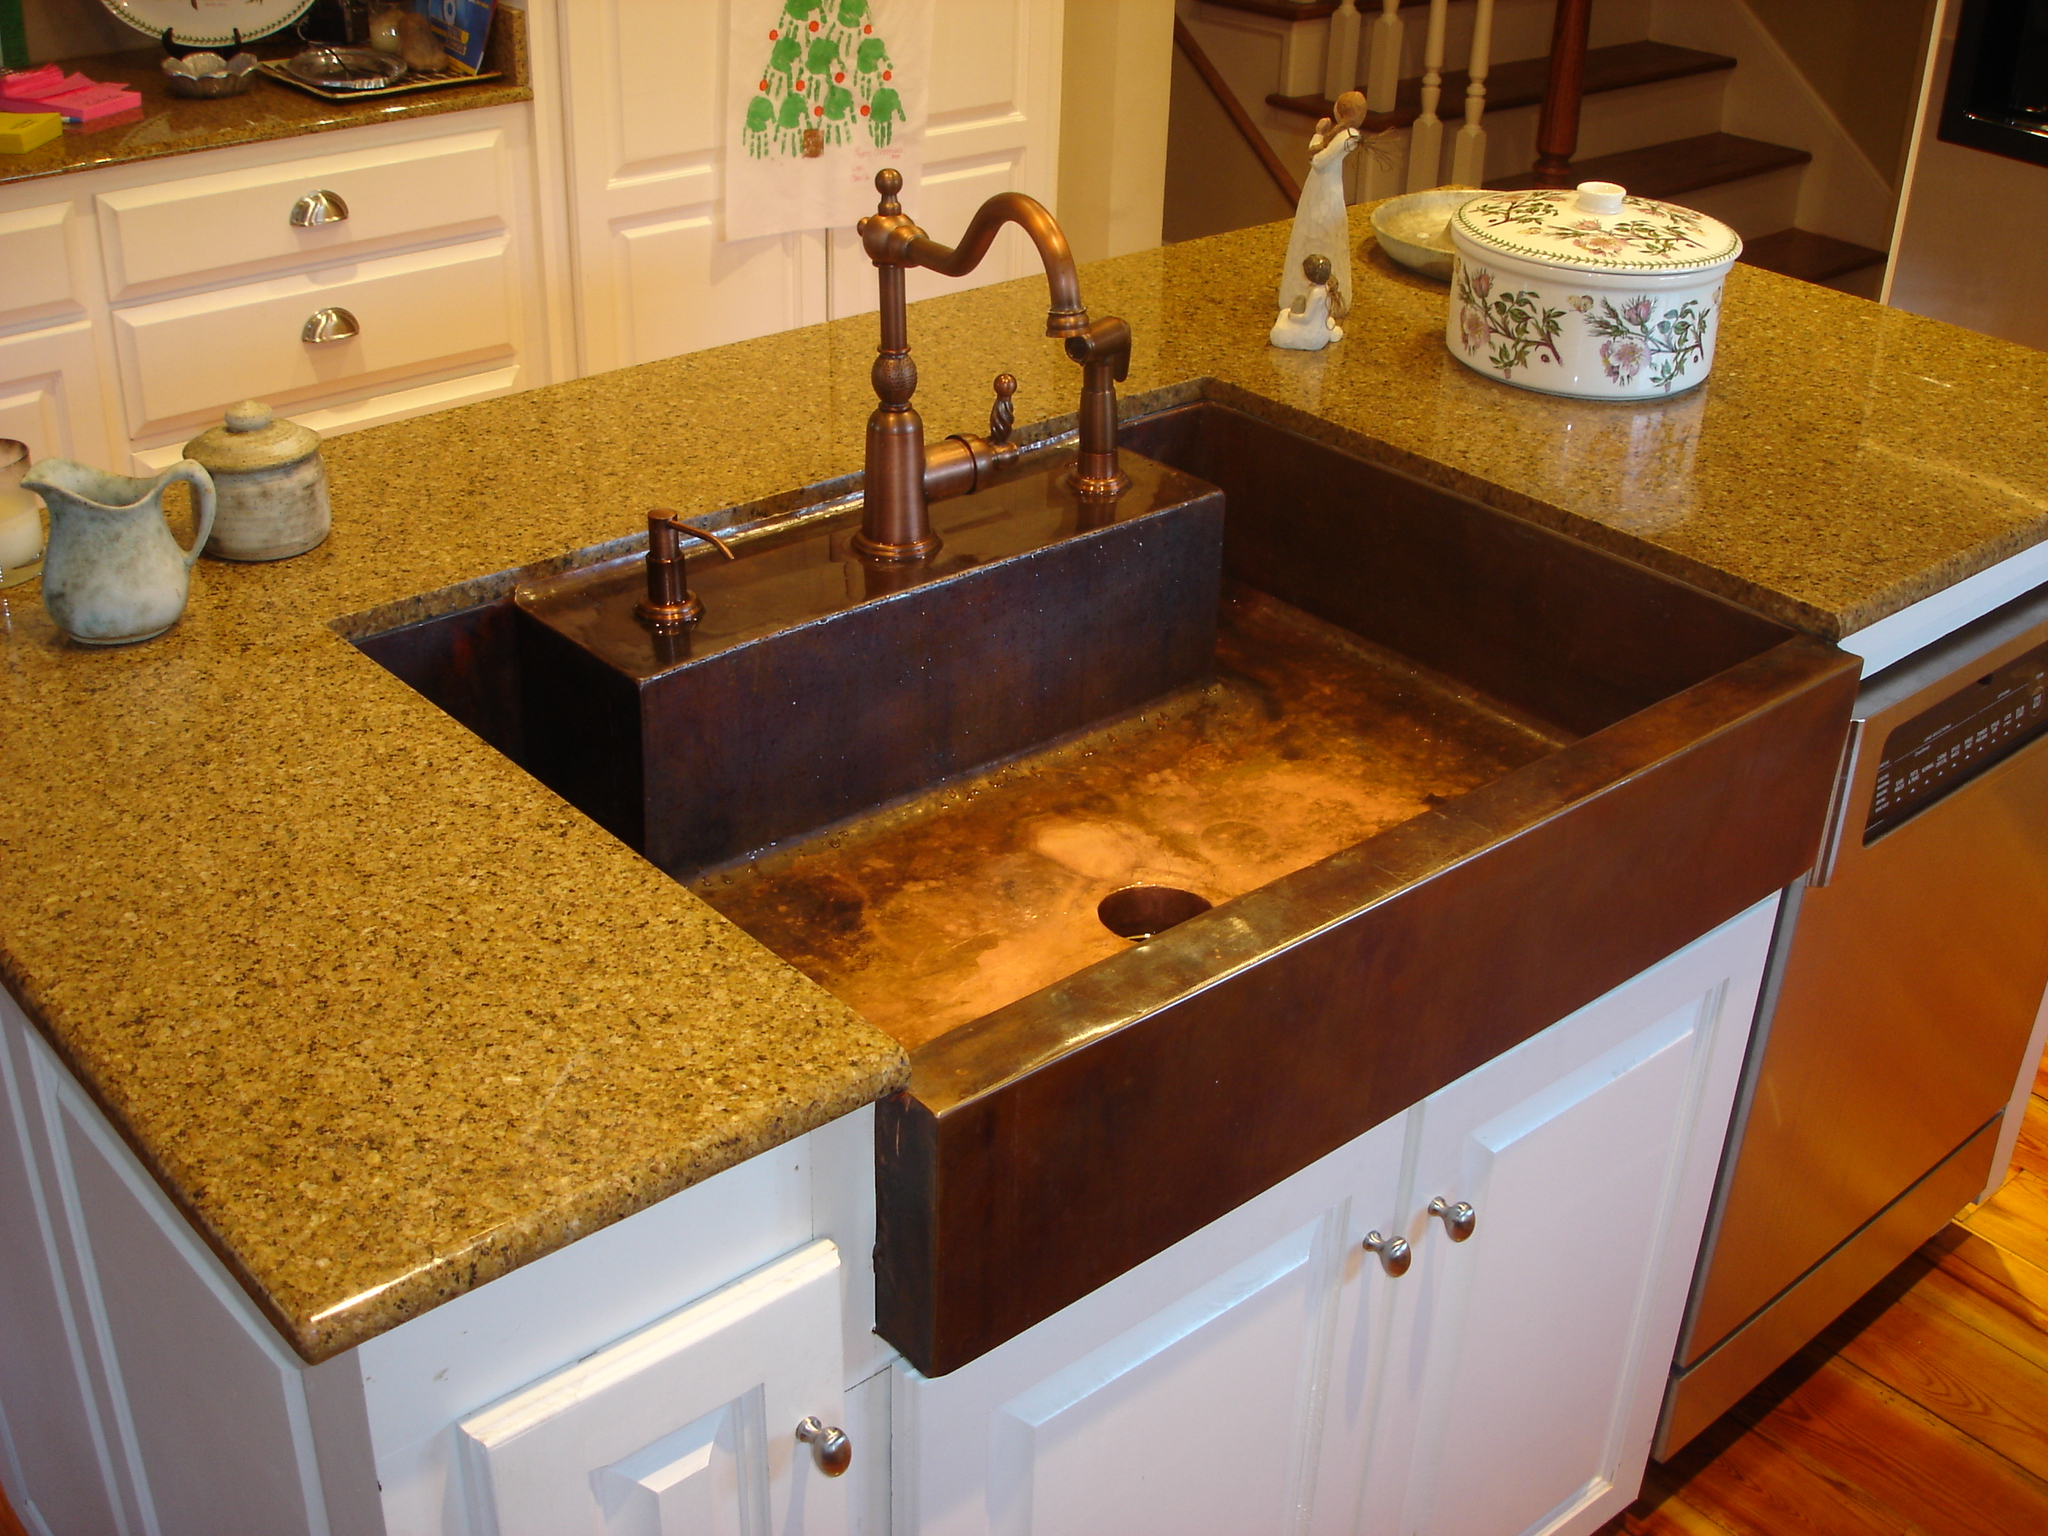 copper kitchen sinks commercial exhaust fans custom sink joel misita archinect